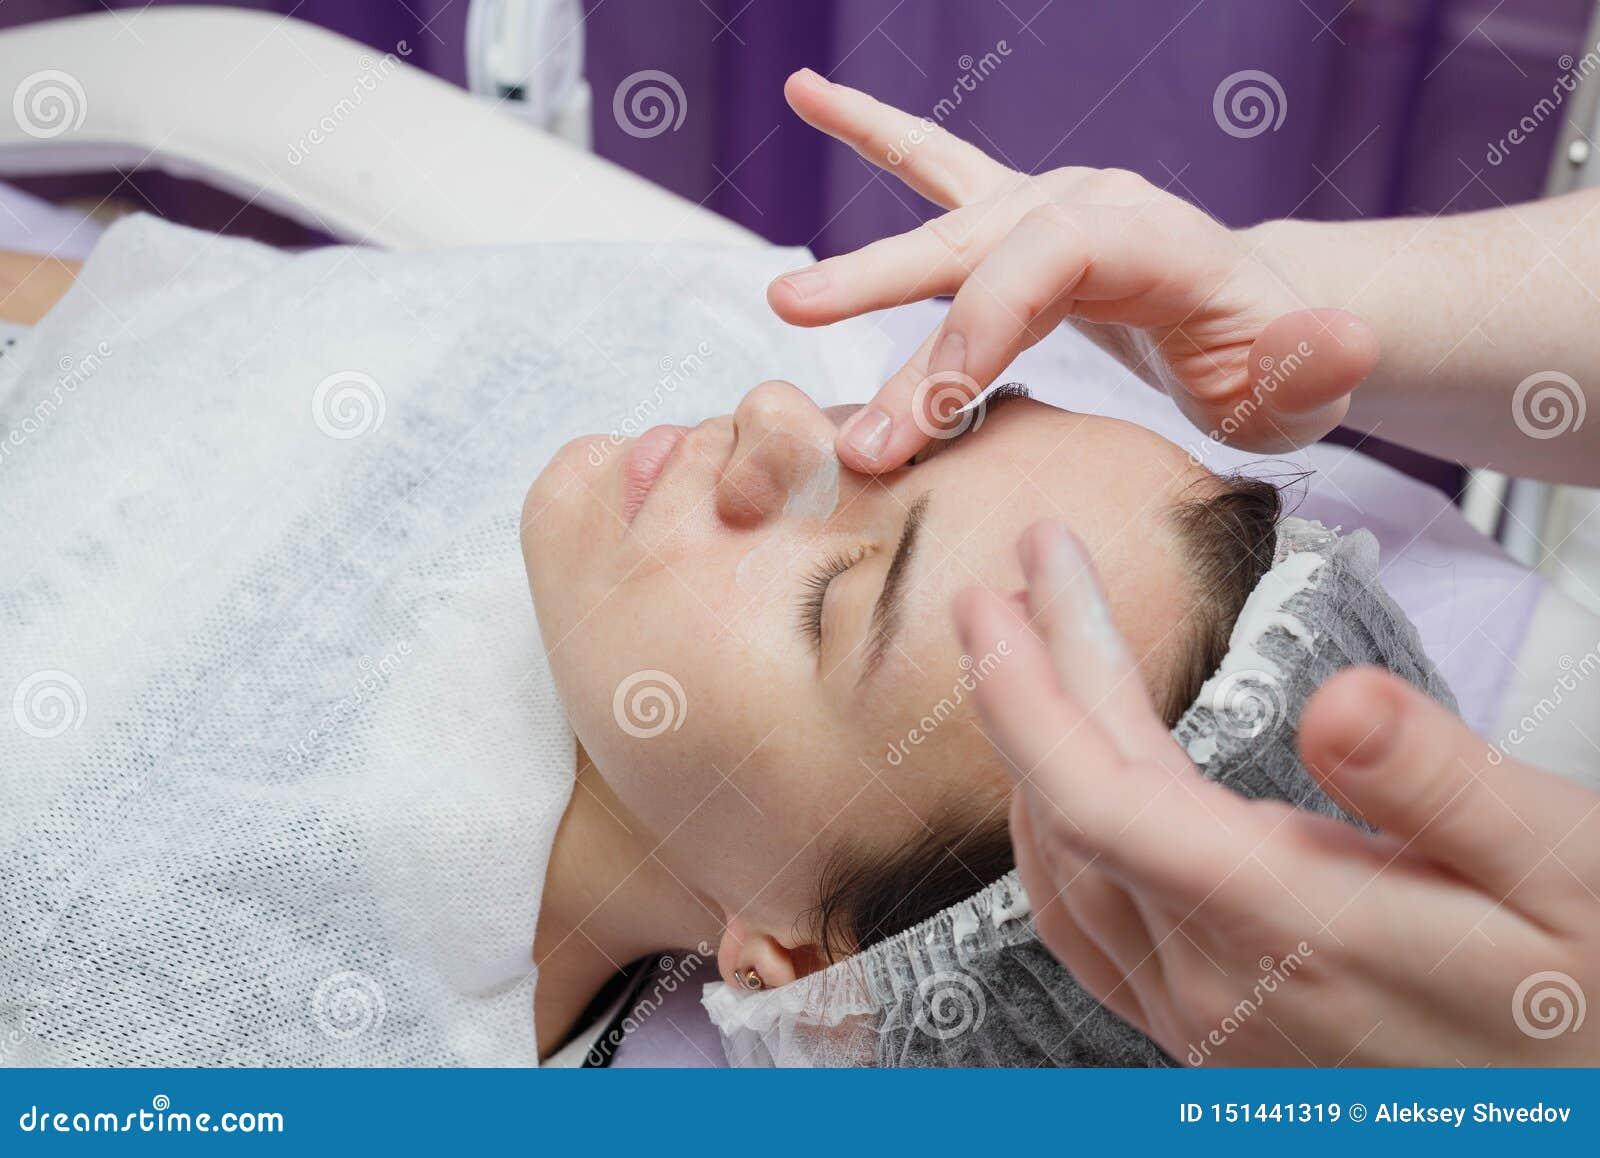 Сливк Nanost Cosmetician после moisturizing лицевая маска